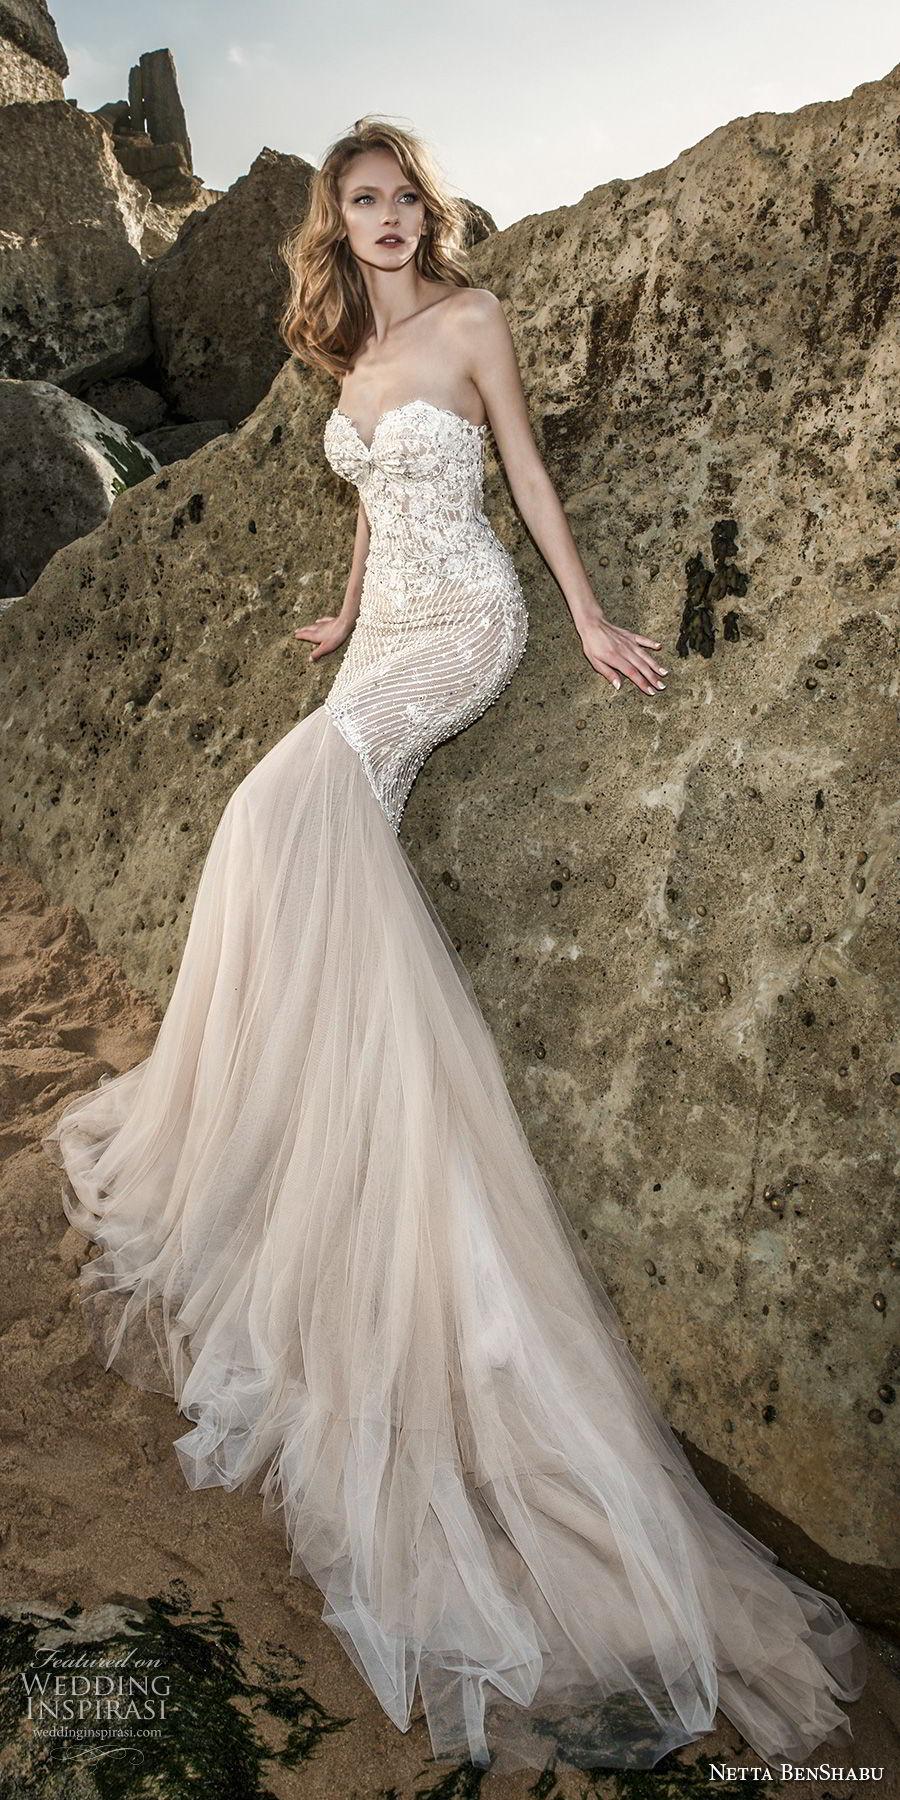 netta benshabu 2017 bridal strapless sweetheart neckline heaily embellished bodice elegant sexy mermaid wedding dress chapel train (23) mv